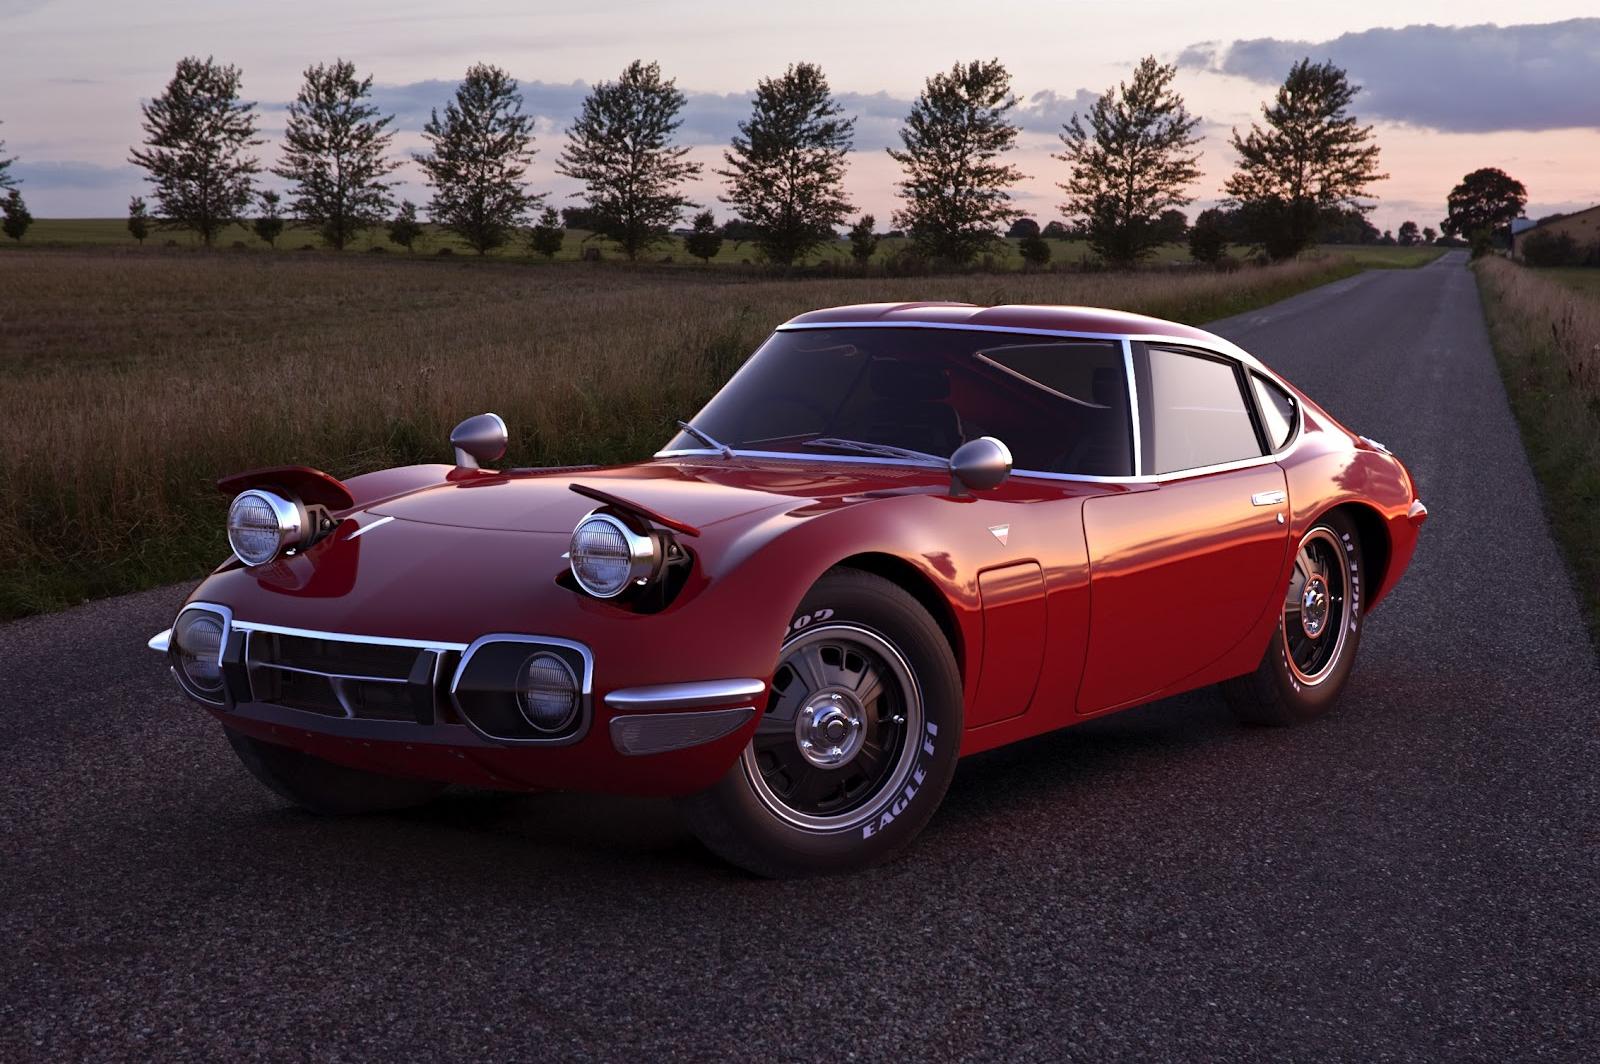 1967-toyota-2000-gt-97679